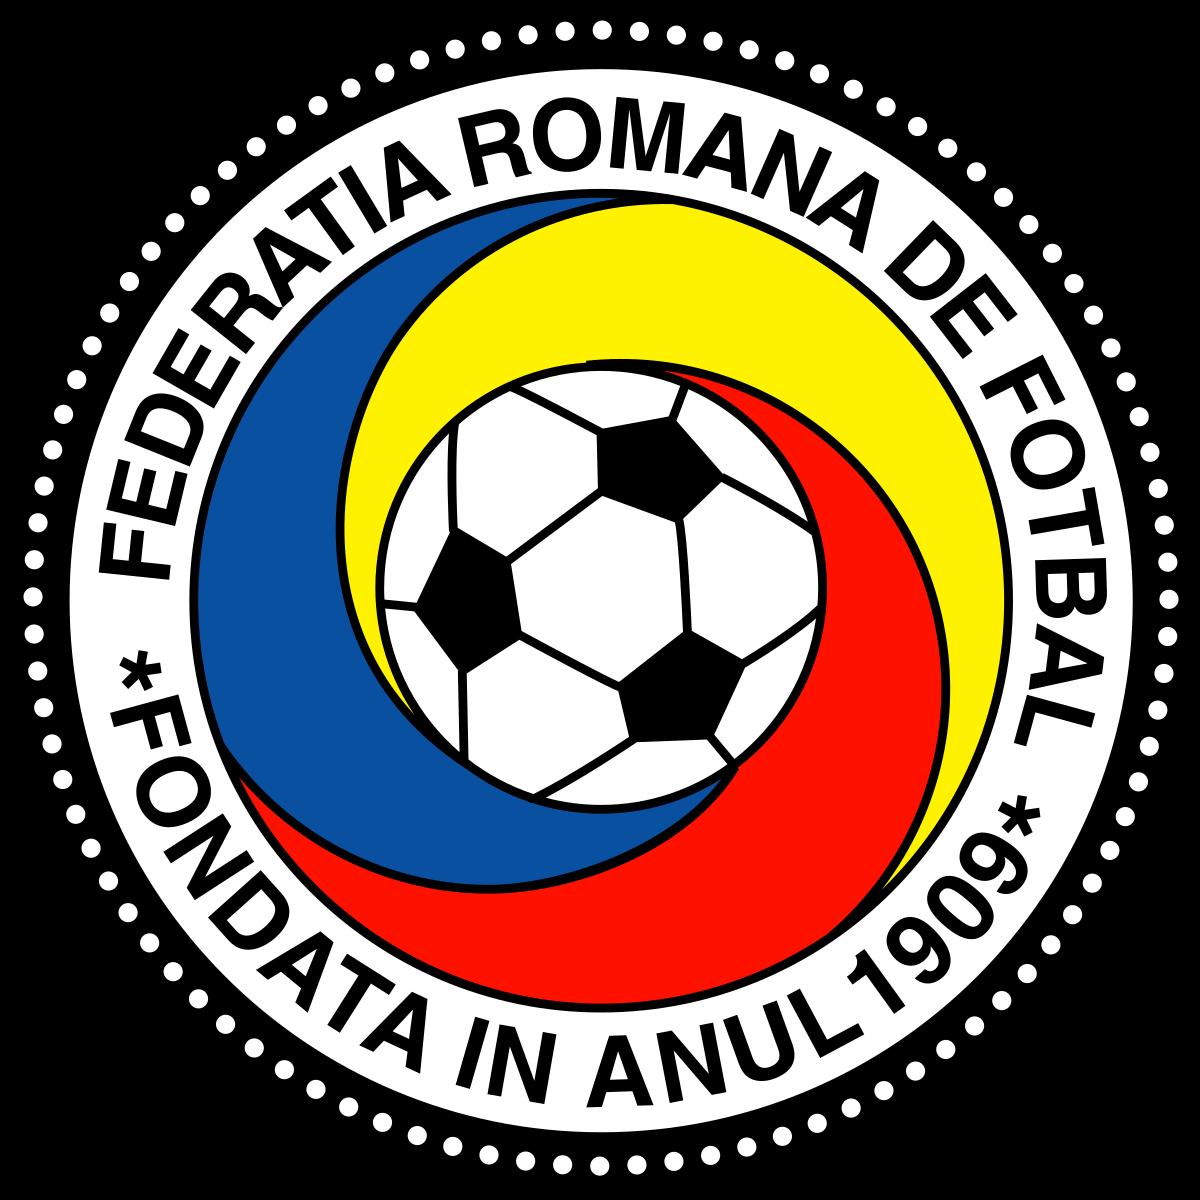 Romanian_Football_Federation_logo